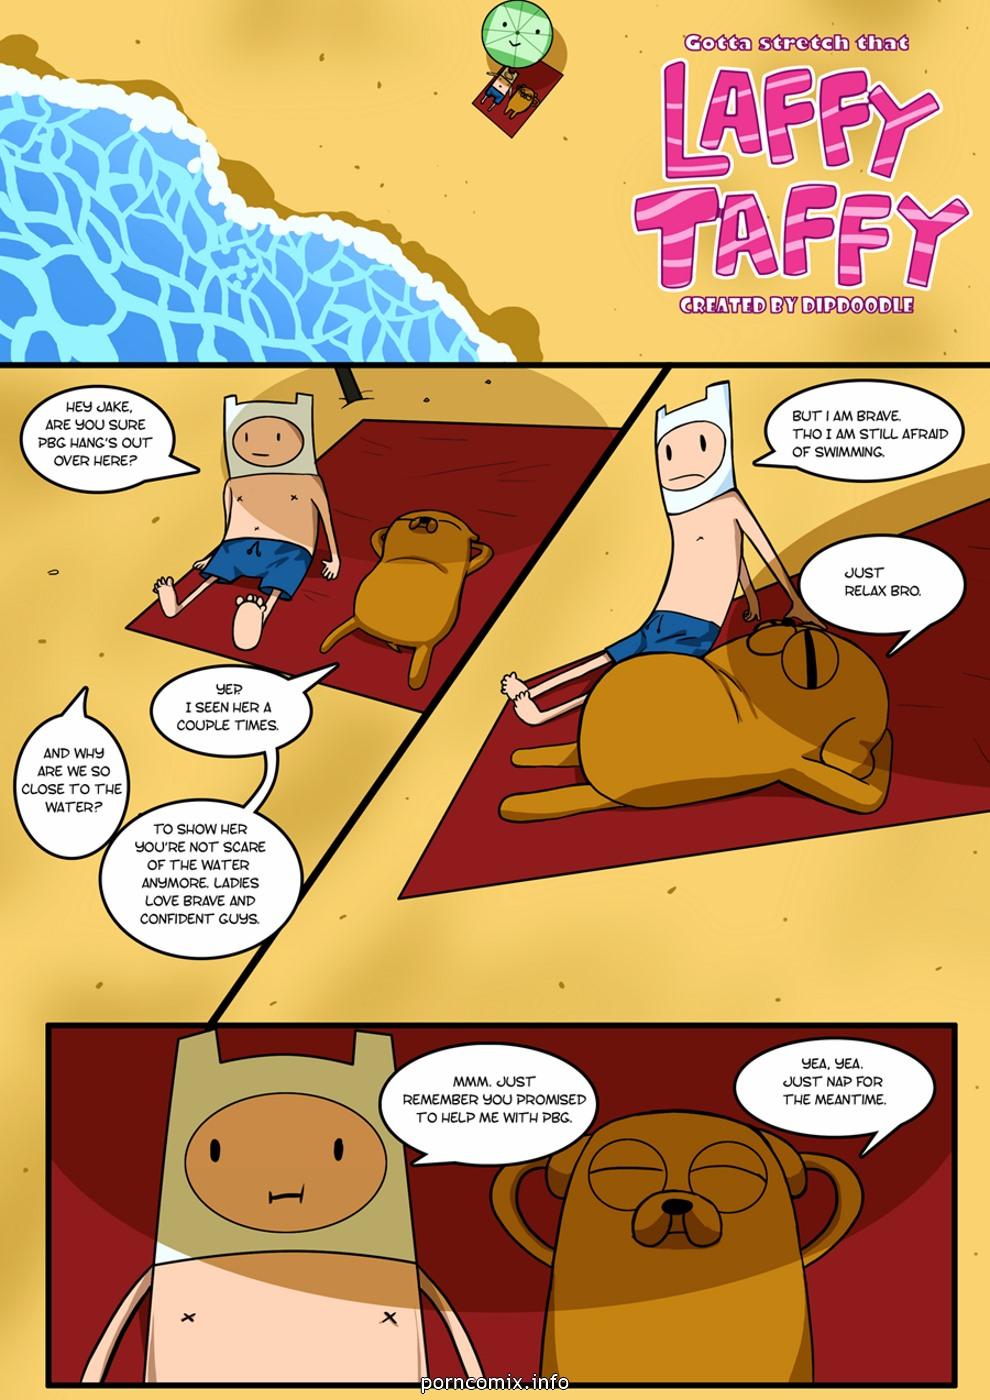 Adventure Time Pirn adventure time- gotta stretch that laffy taffy porn comics 8